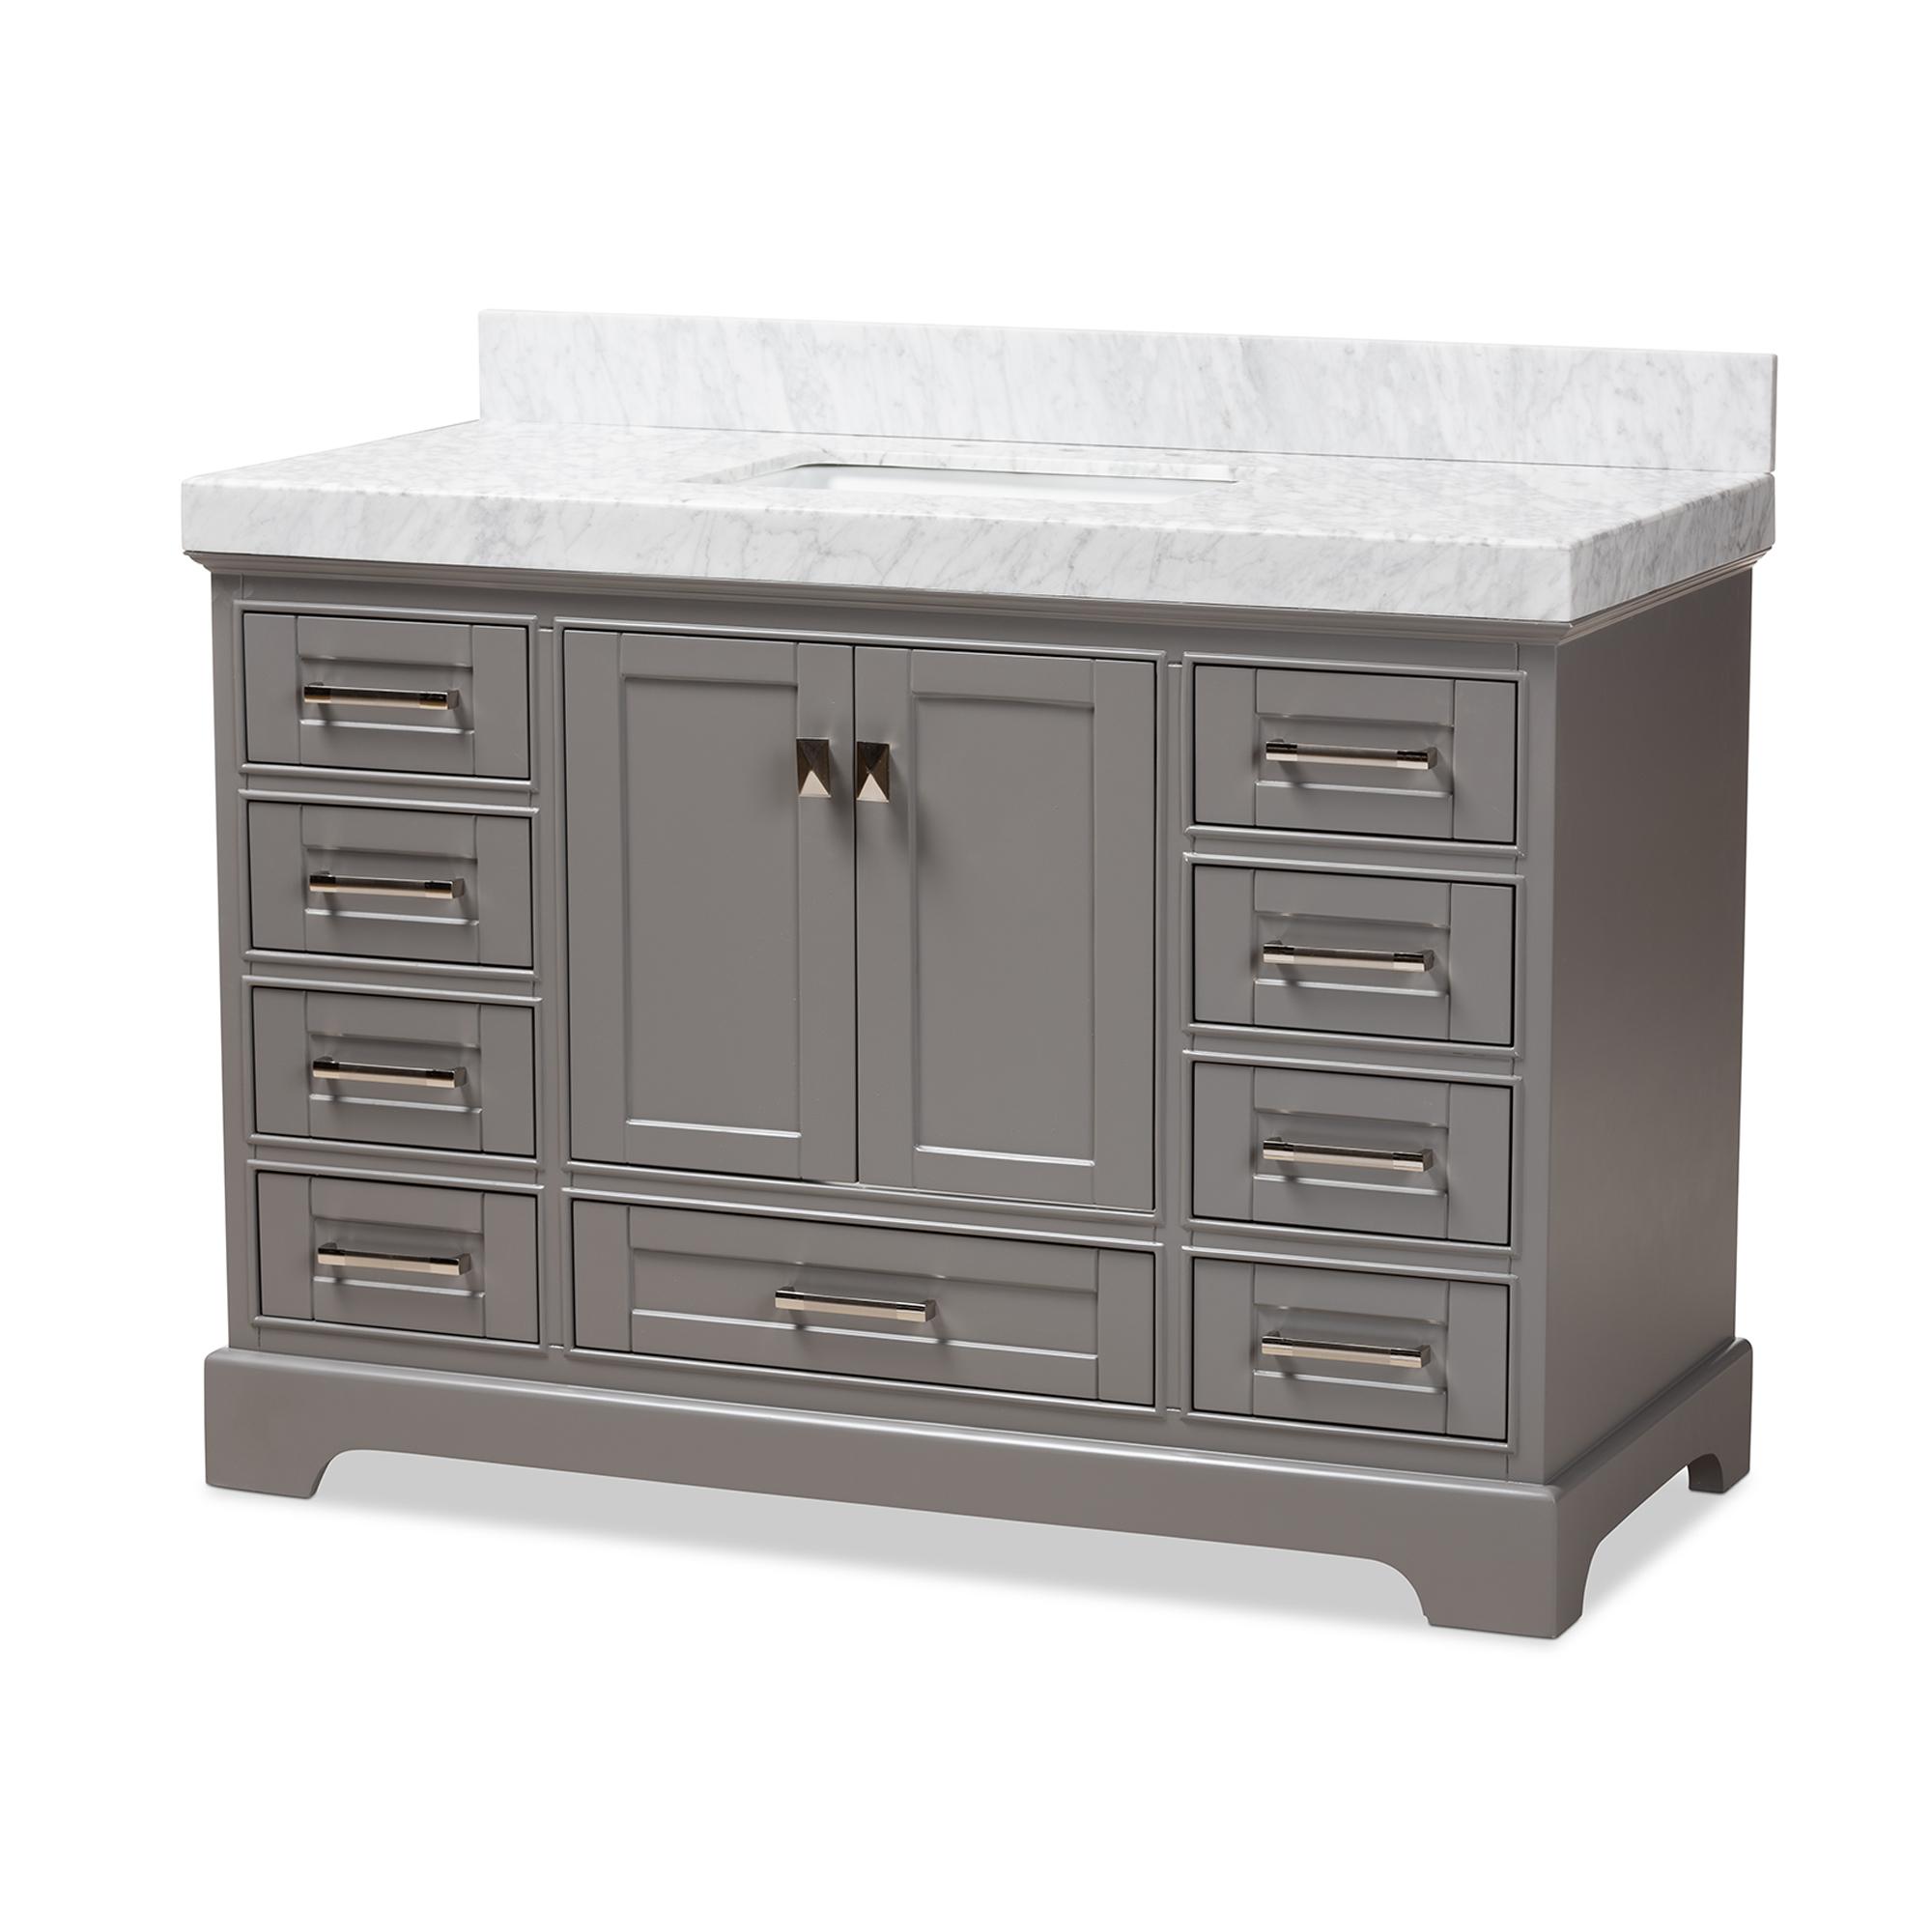 Baxton Studio Amaris 48 Inch Transitional Grey Finished Wood And Marble Single Sink Bathroom Vanity